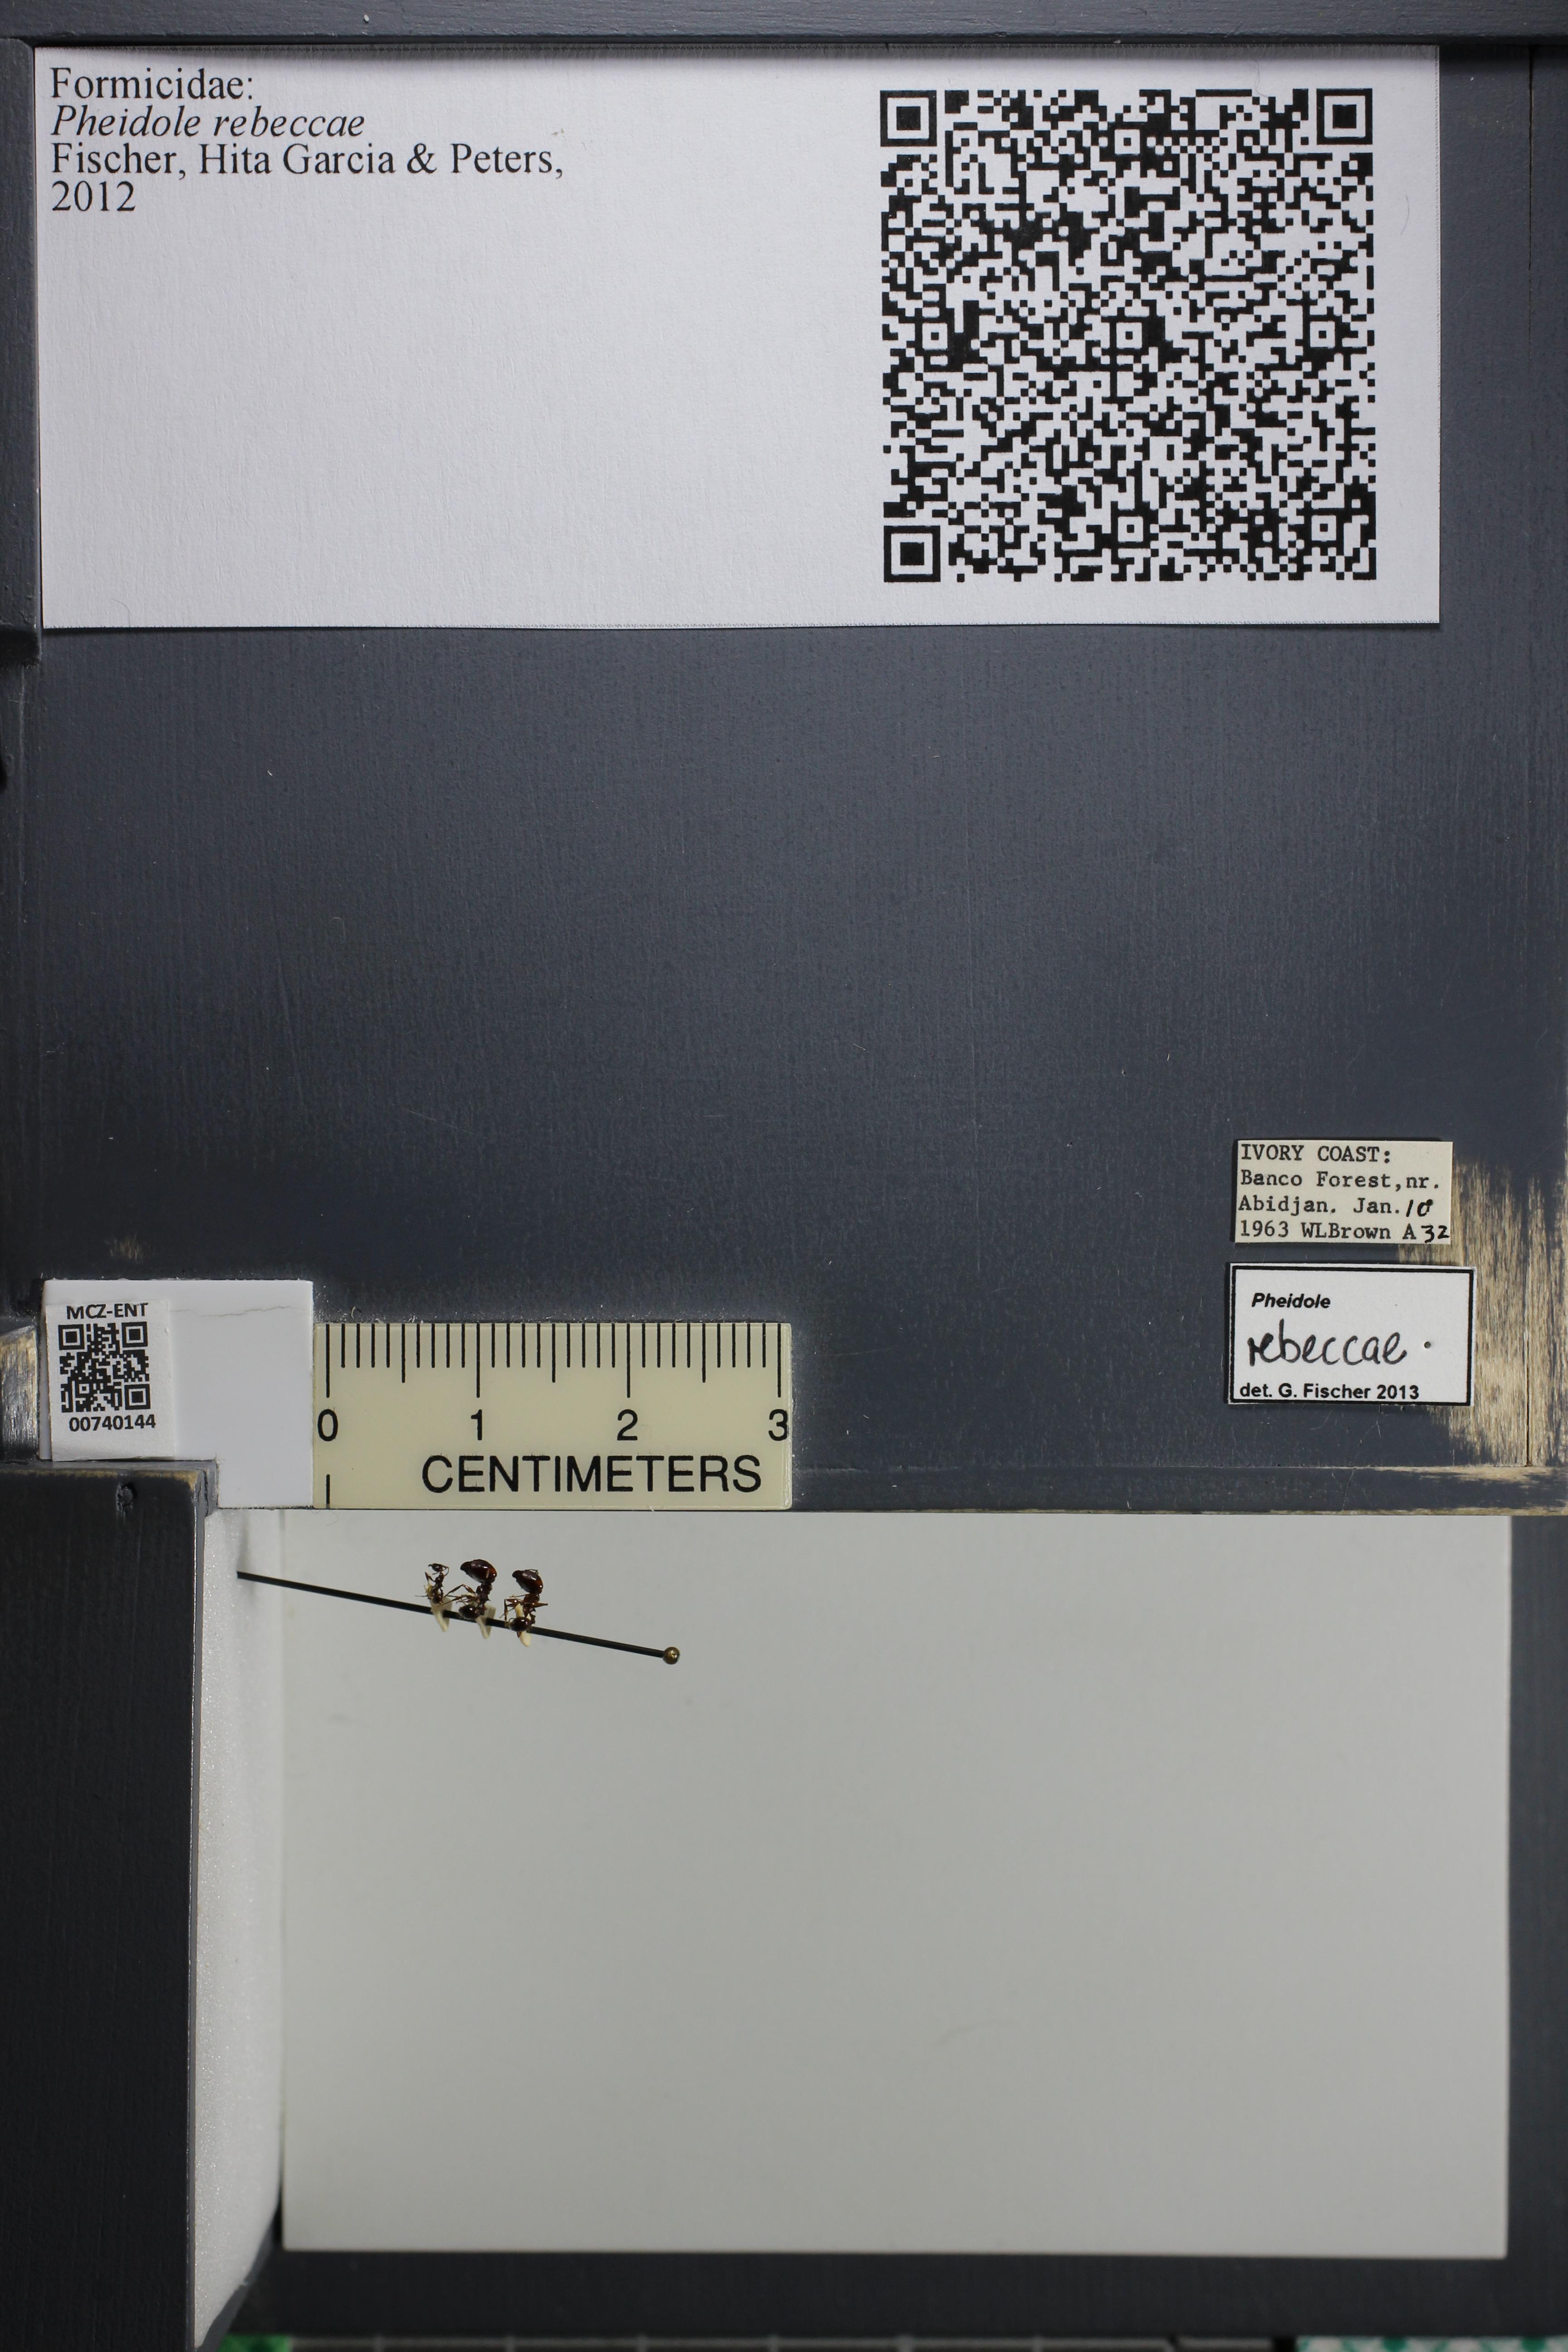 Media of type image, MCZ:Ent:740144 Identified as Pheidole rebeccae.